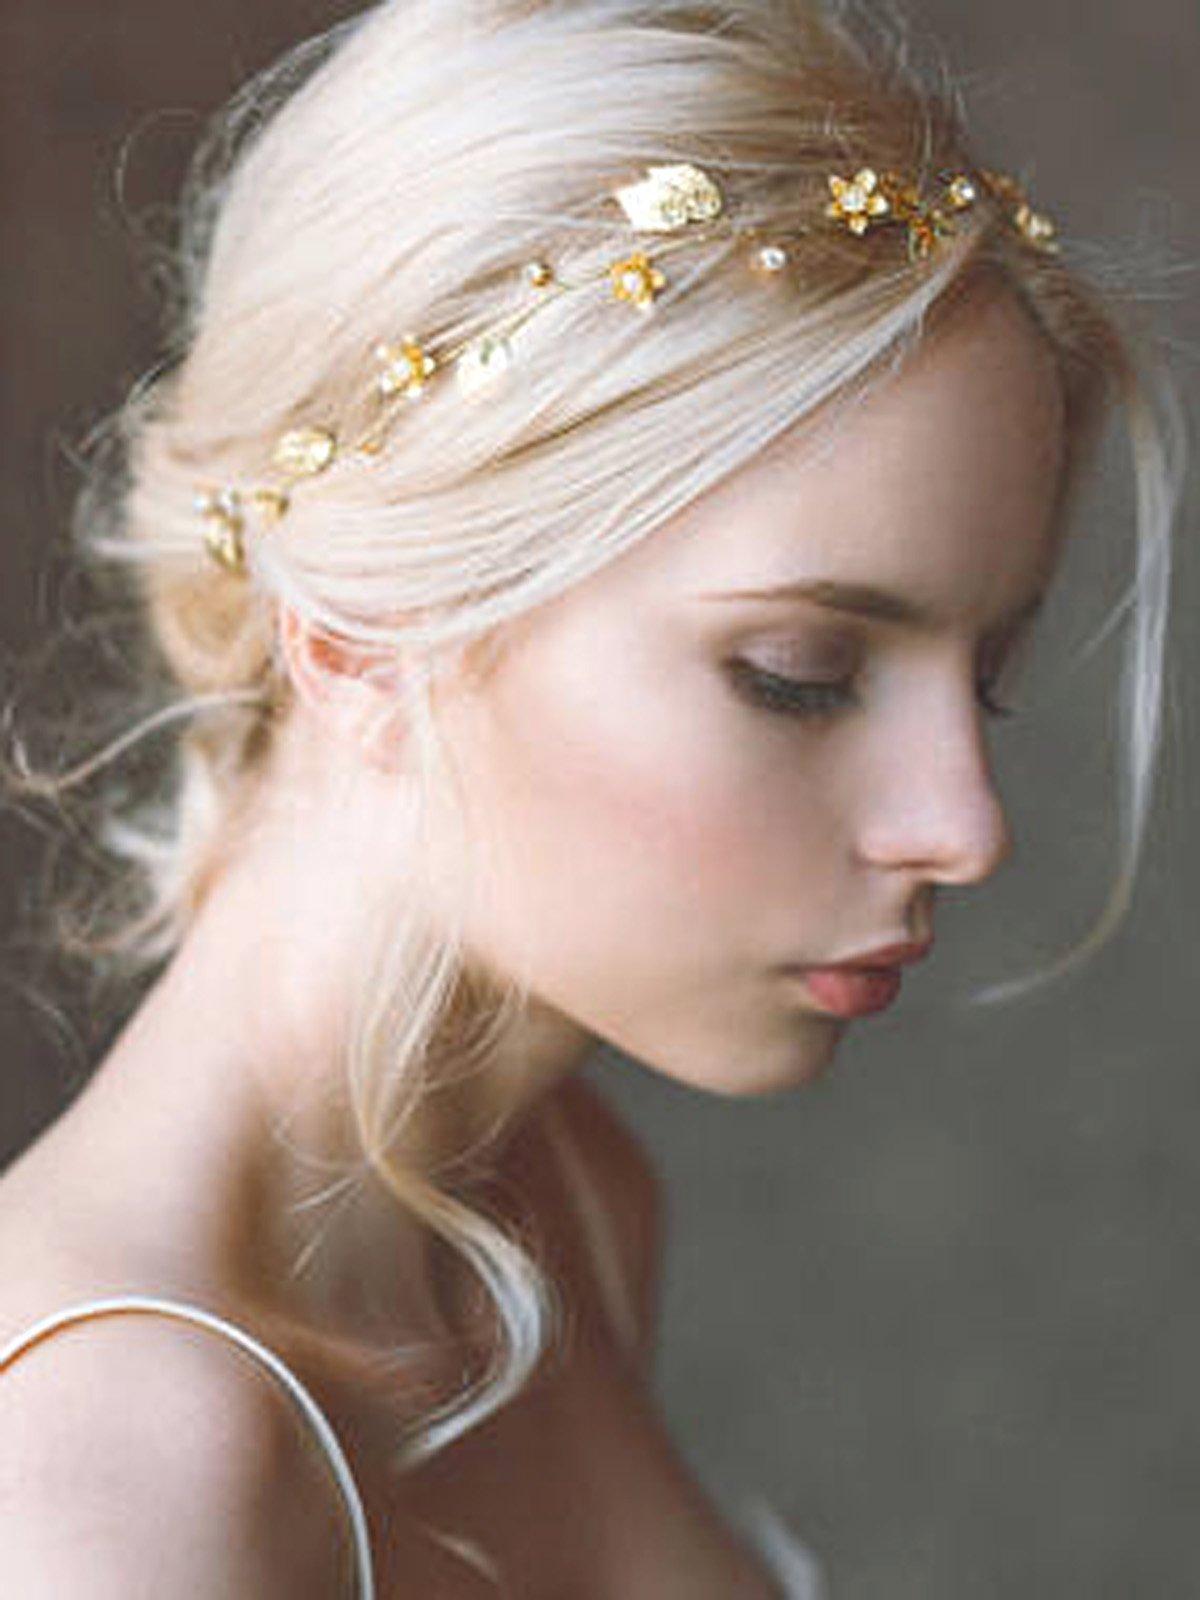 Yean Bride Wedding Hair Vine Headband Gold Leaf Bridal Accessories for Women (Gold) by Yean